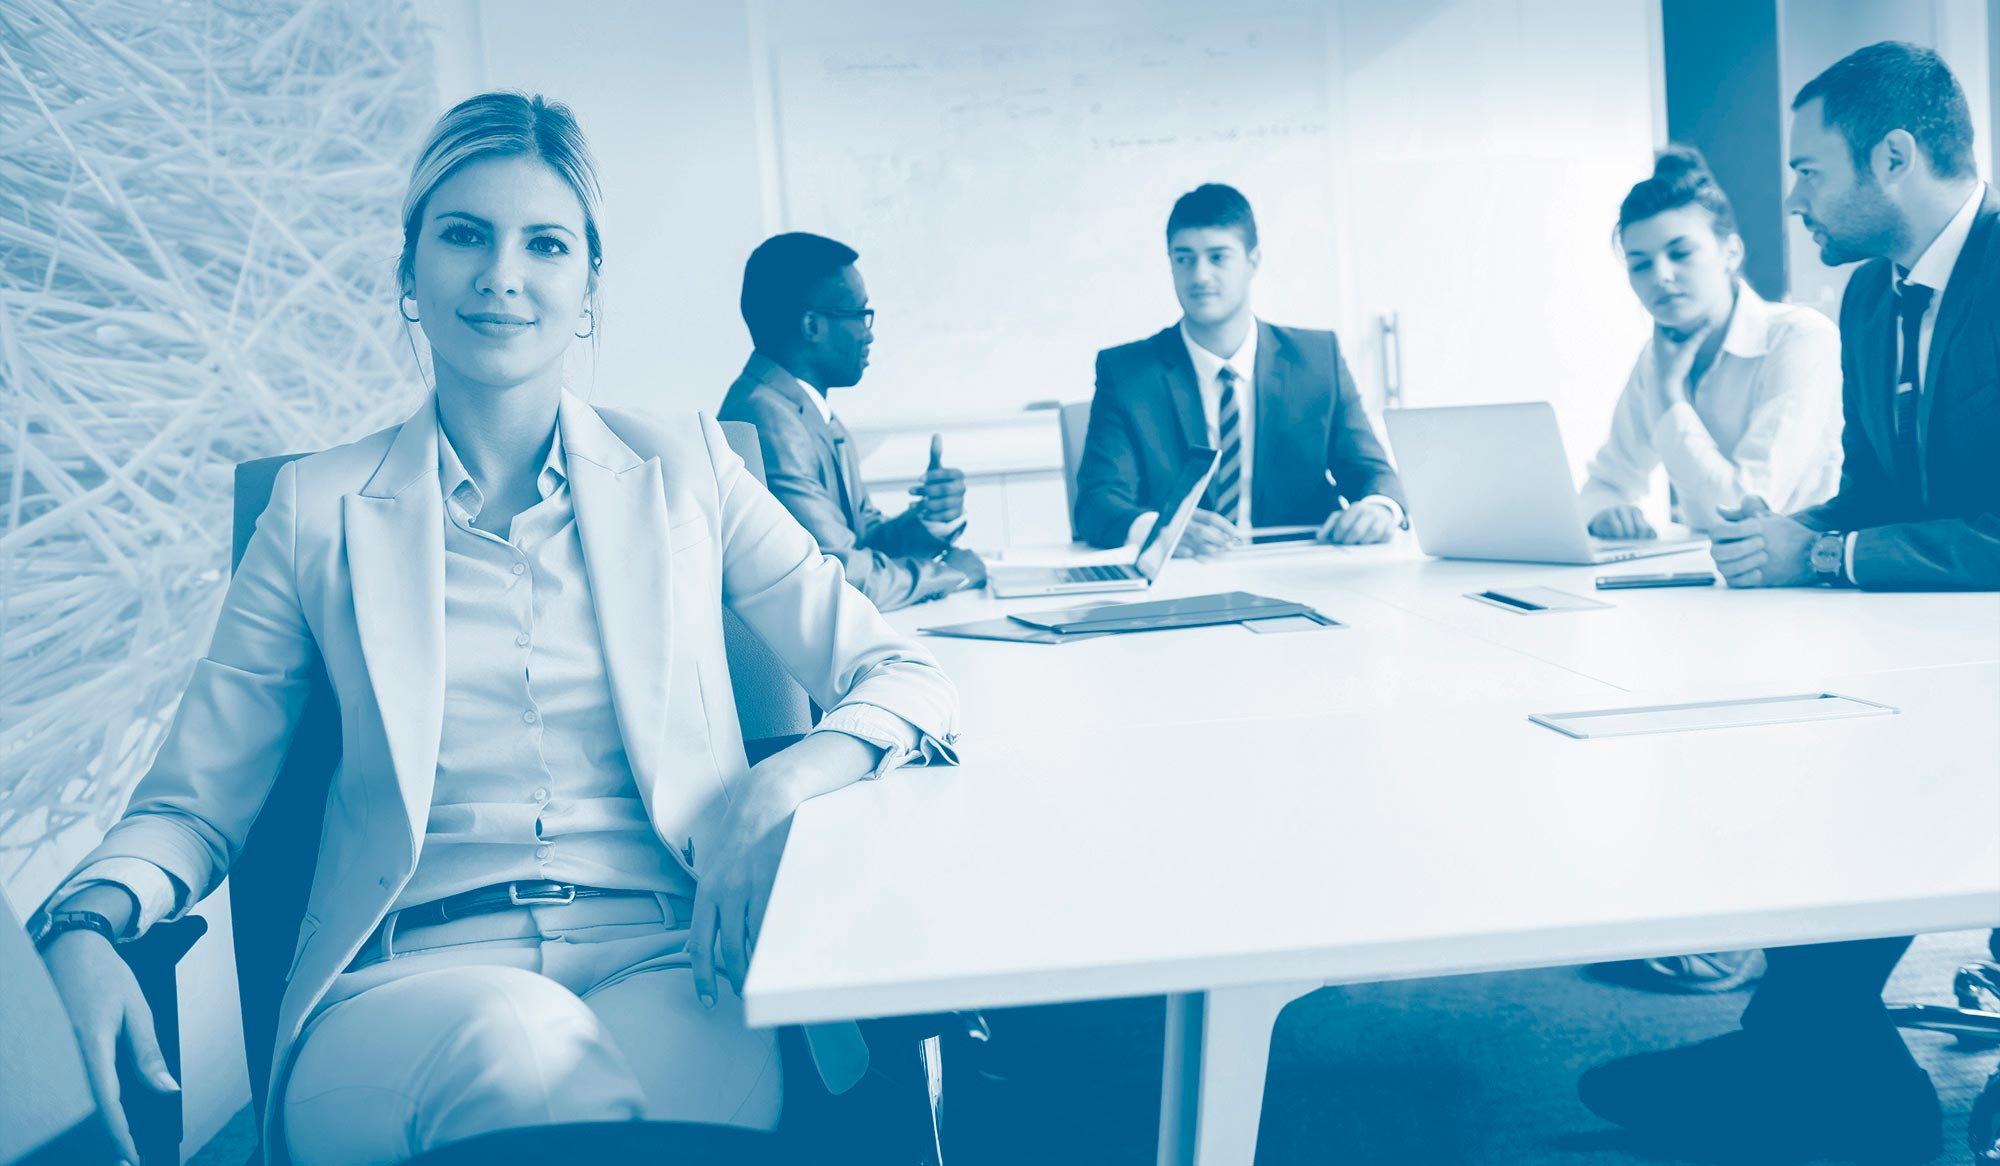 factfinance-fiscale-advisering